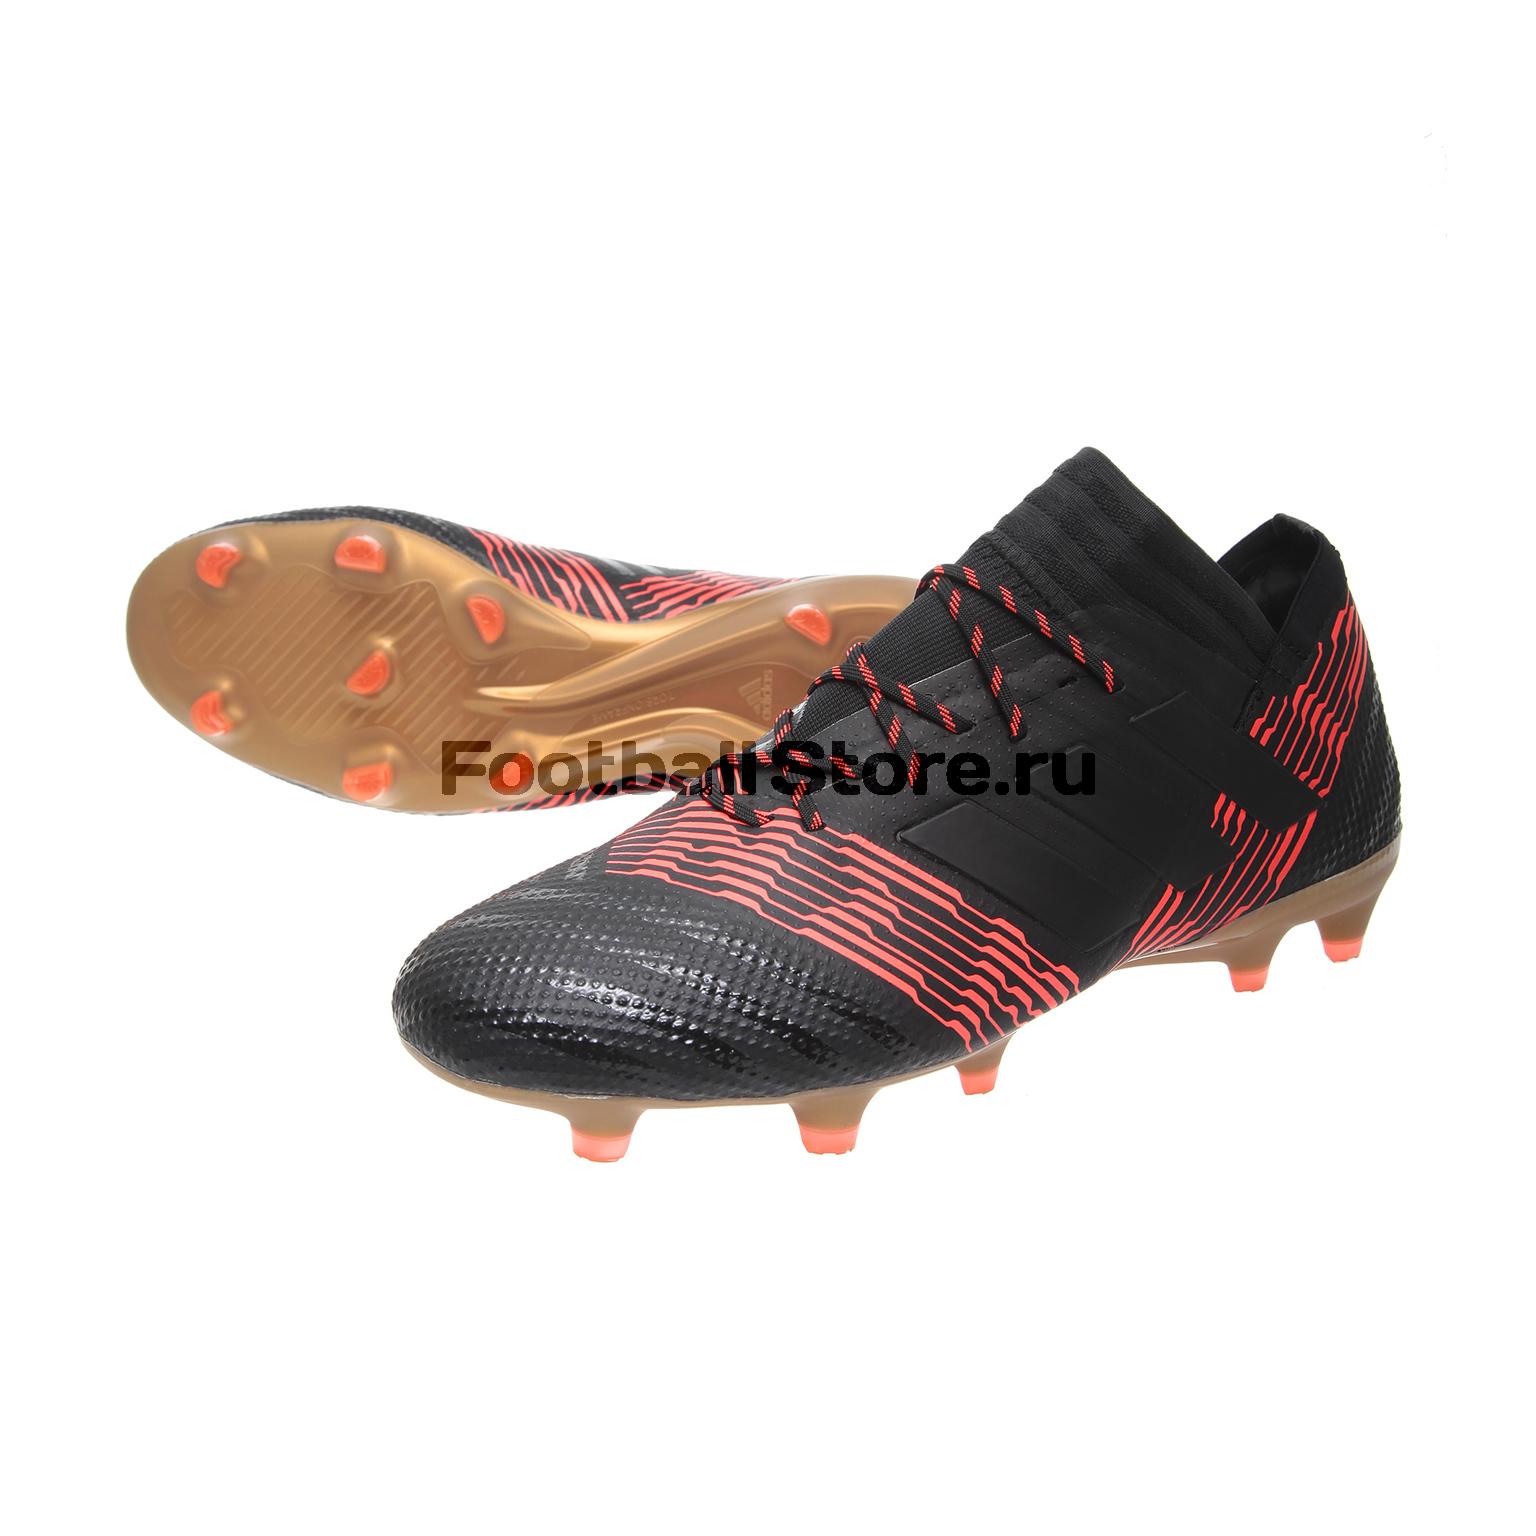 Бутсы Adidas Nemeziz 17.1 FG CP8932 бутсы adidas x 17 1 fg bb6353